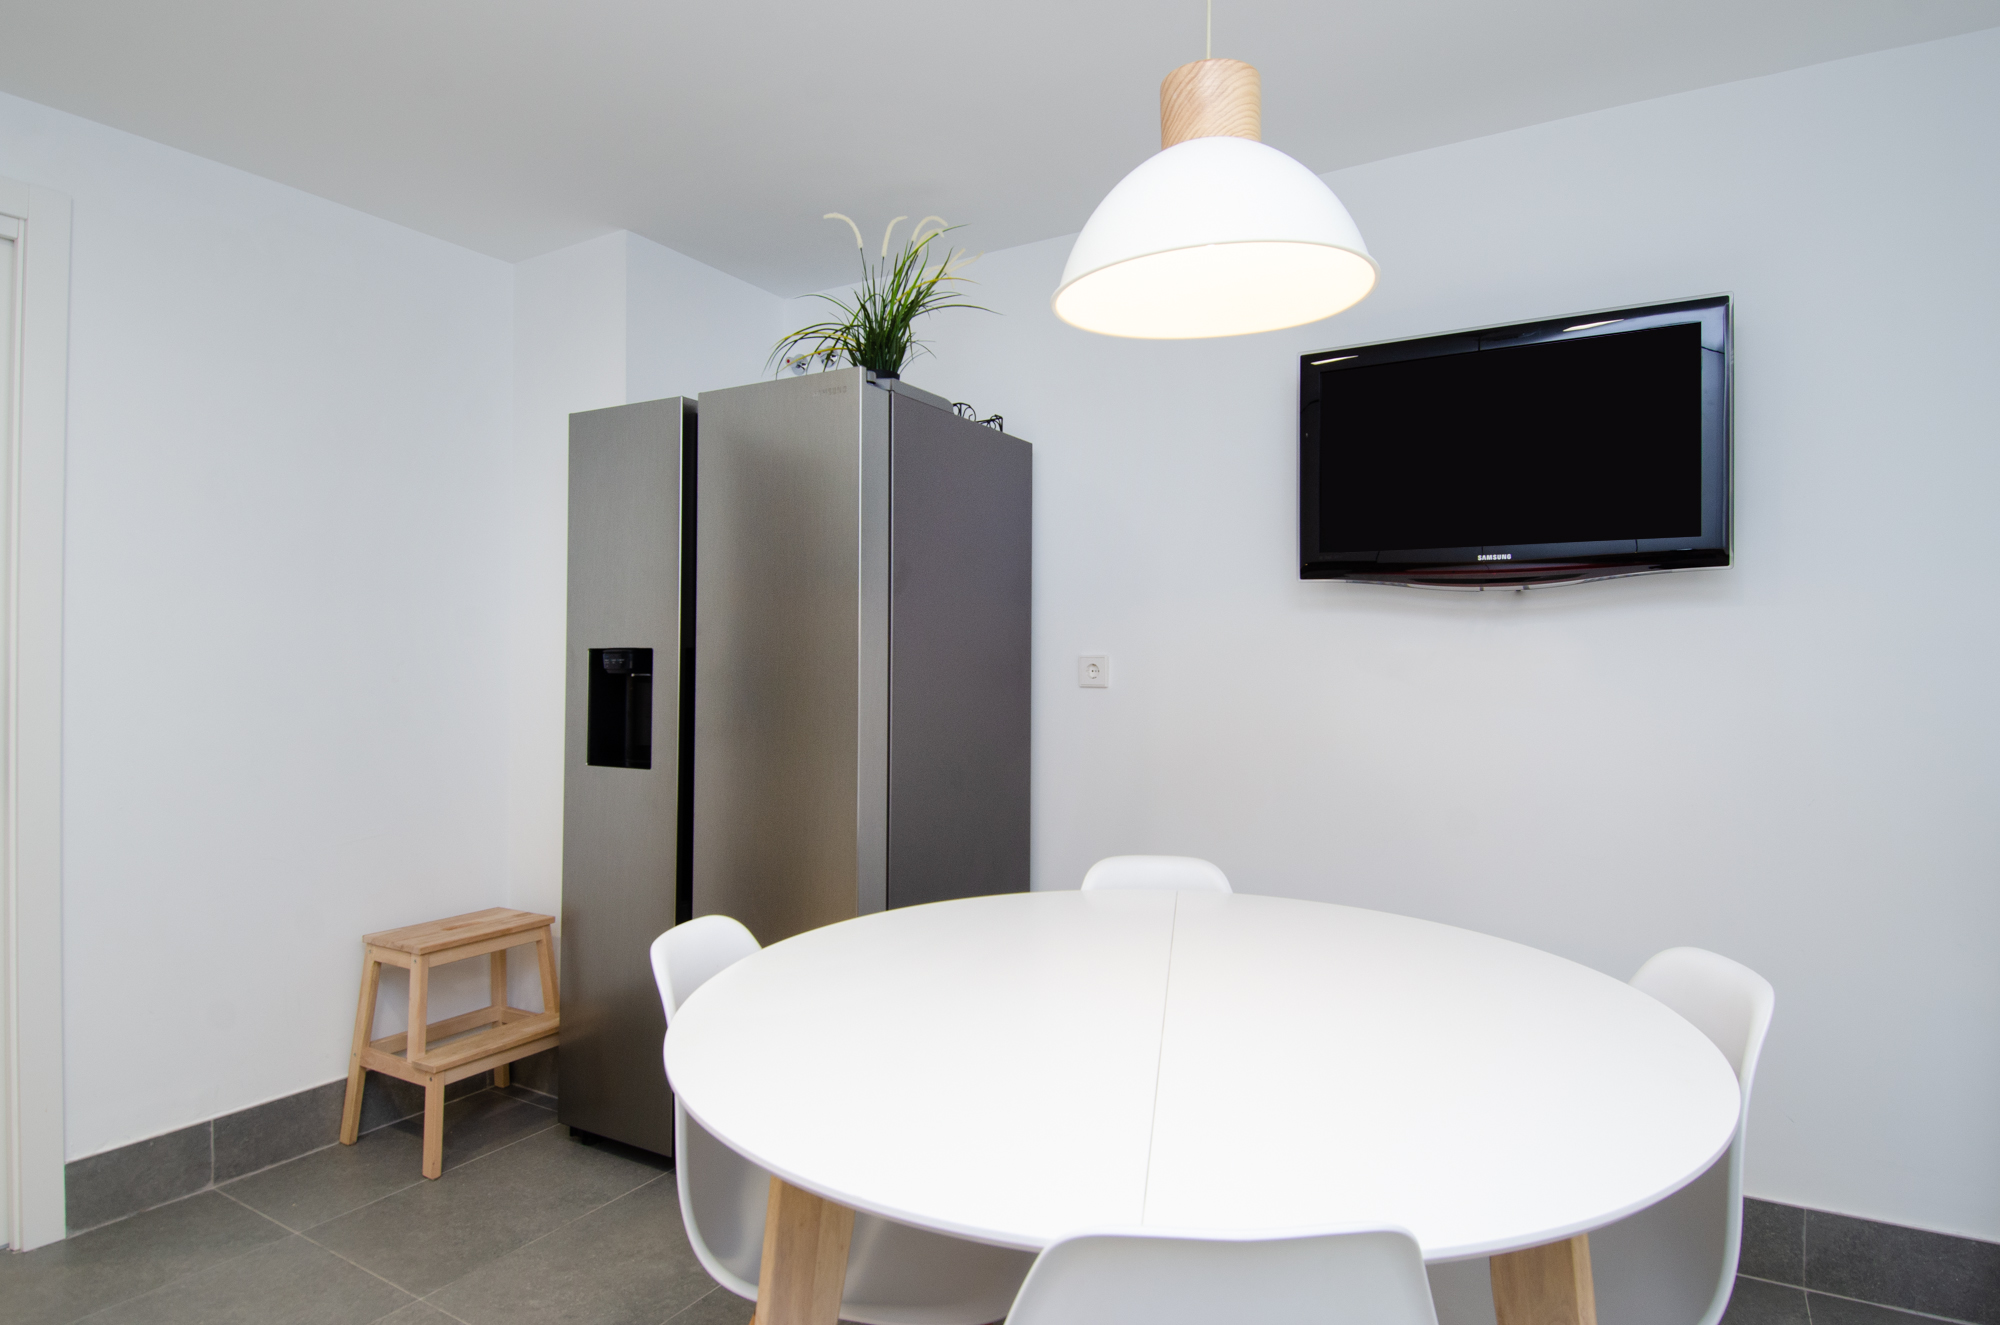 interiorismo-decoracion-ana-de-cabo-reforma-piso-santa-eugenia (18)